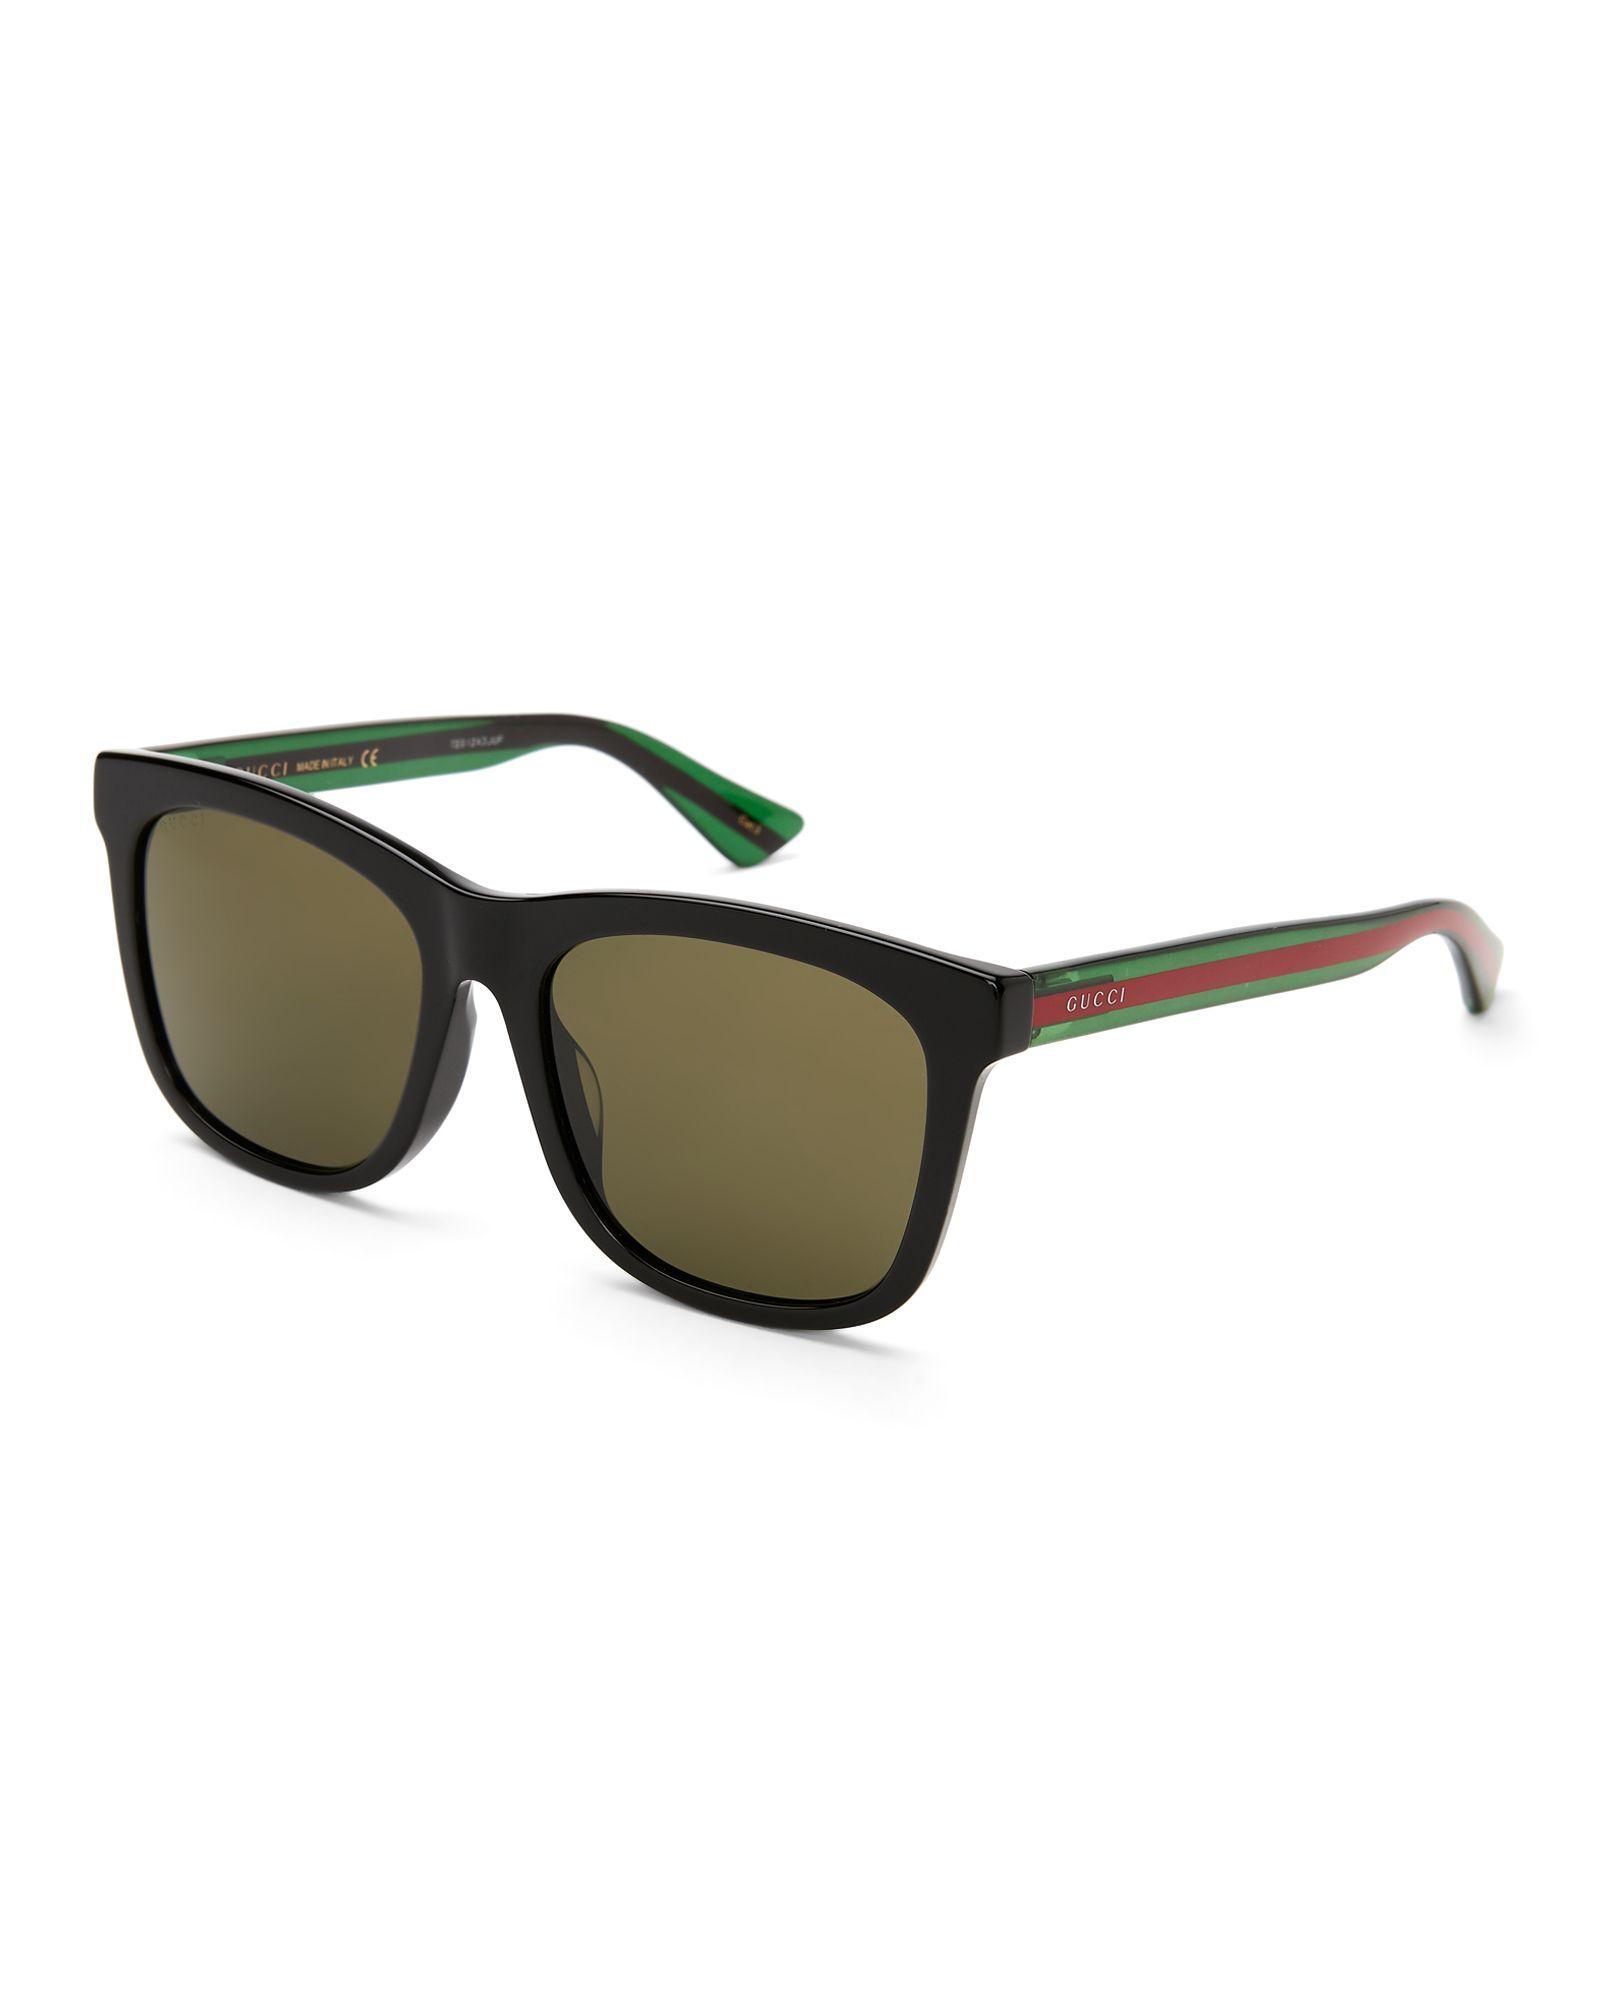 GG 0057/S Black XL Wayfarer Sunglasses